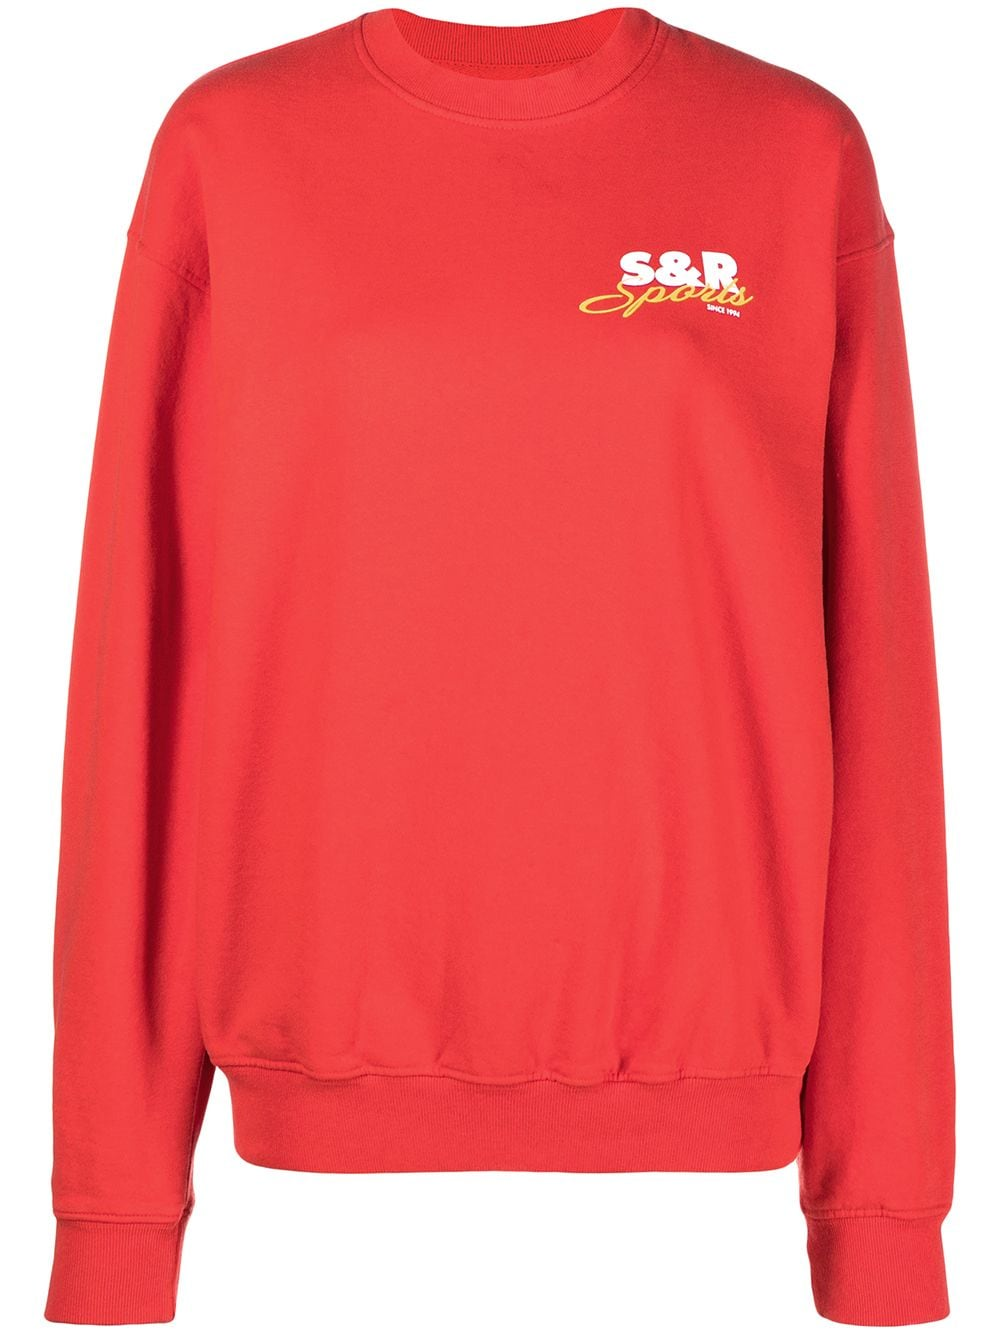 CREW NECK SWEATER SPORTY & RICH | Sweatshirts | CR081CY